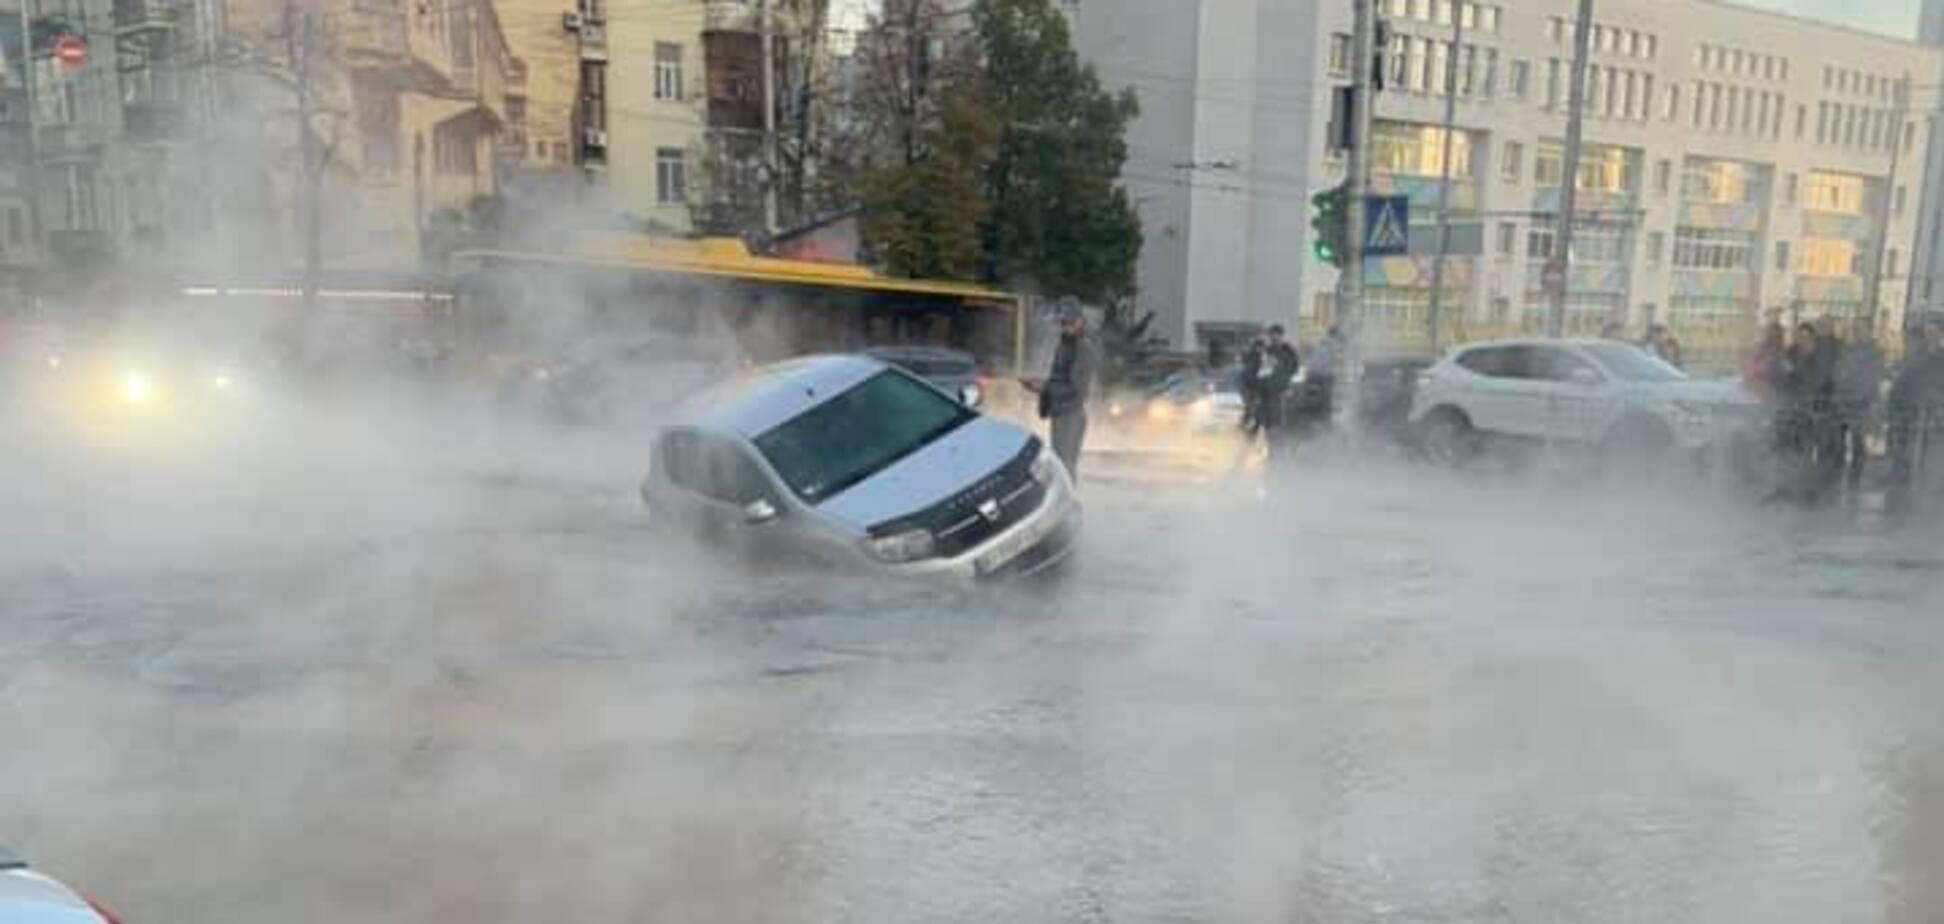 Вцентре Киева прорвало трубу с кипятком